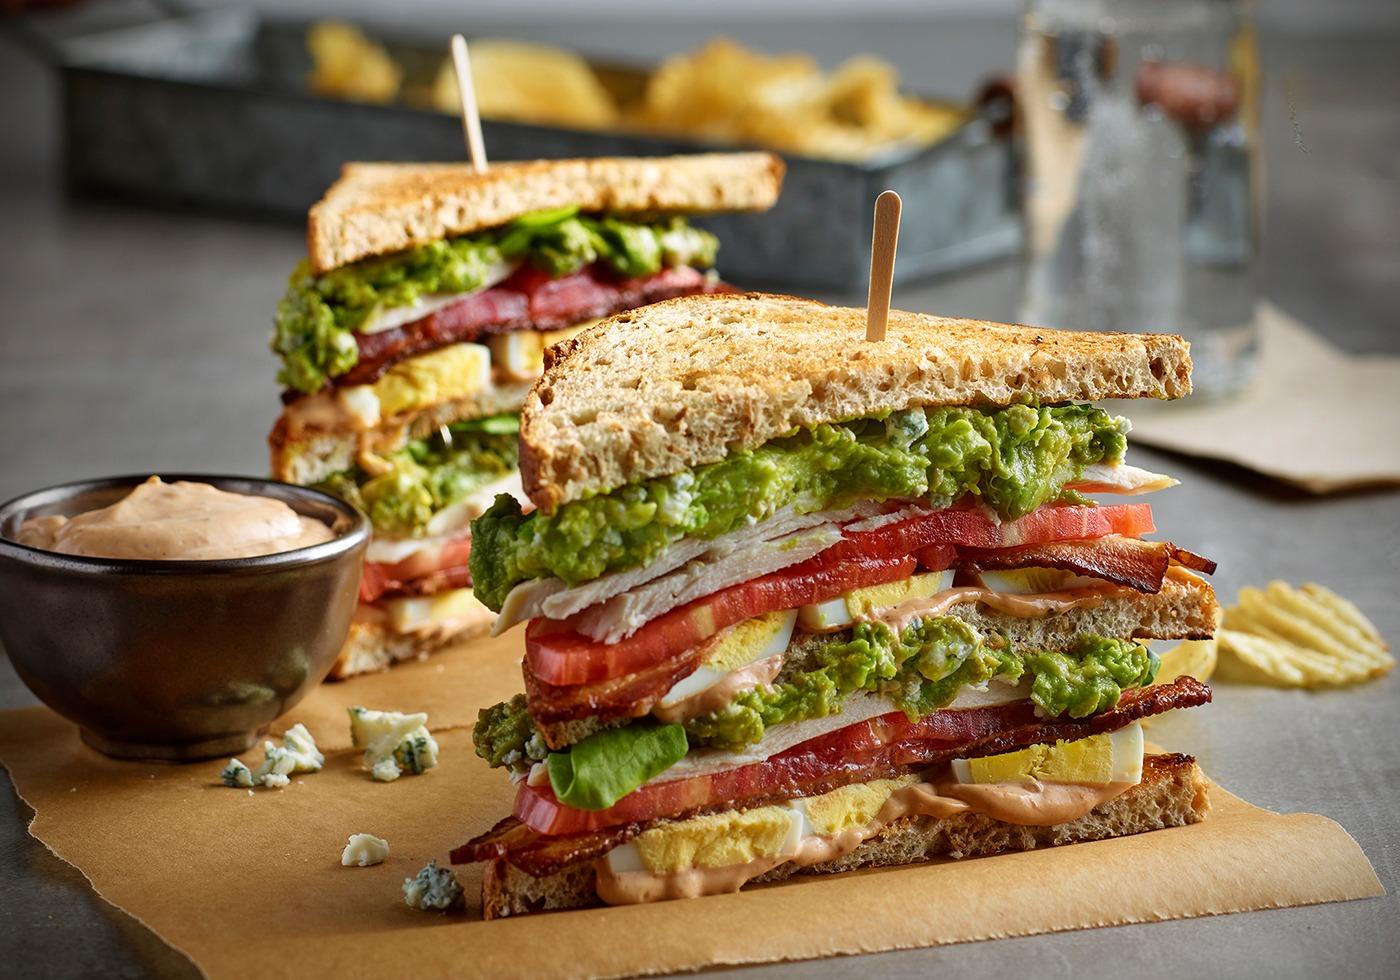 The cobb club sandwich cut in triangles